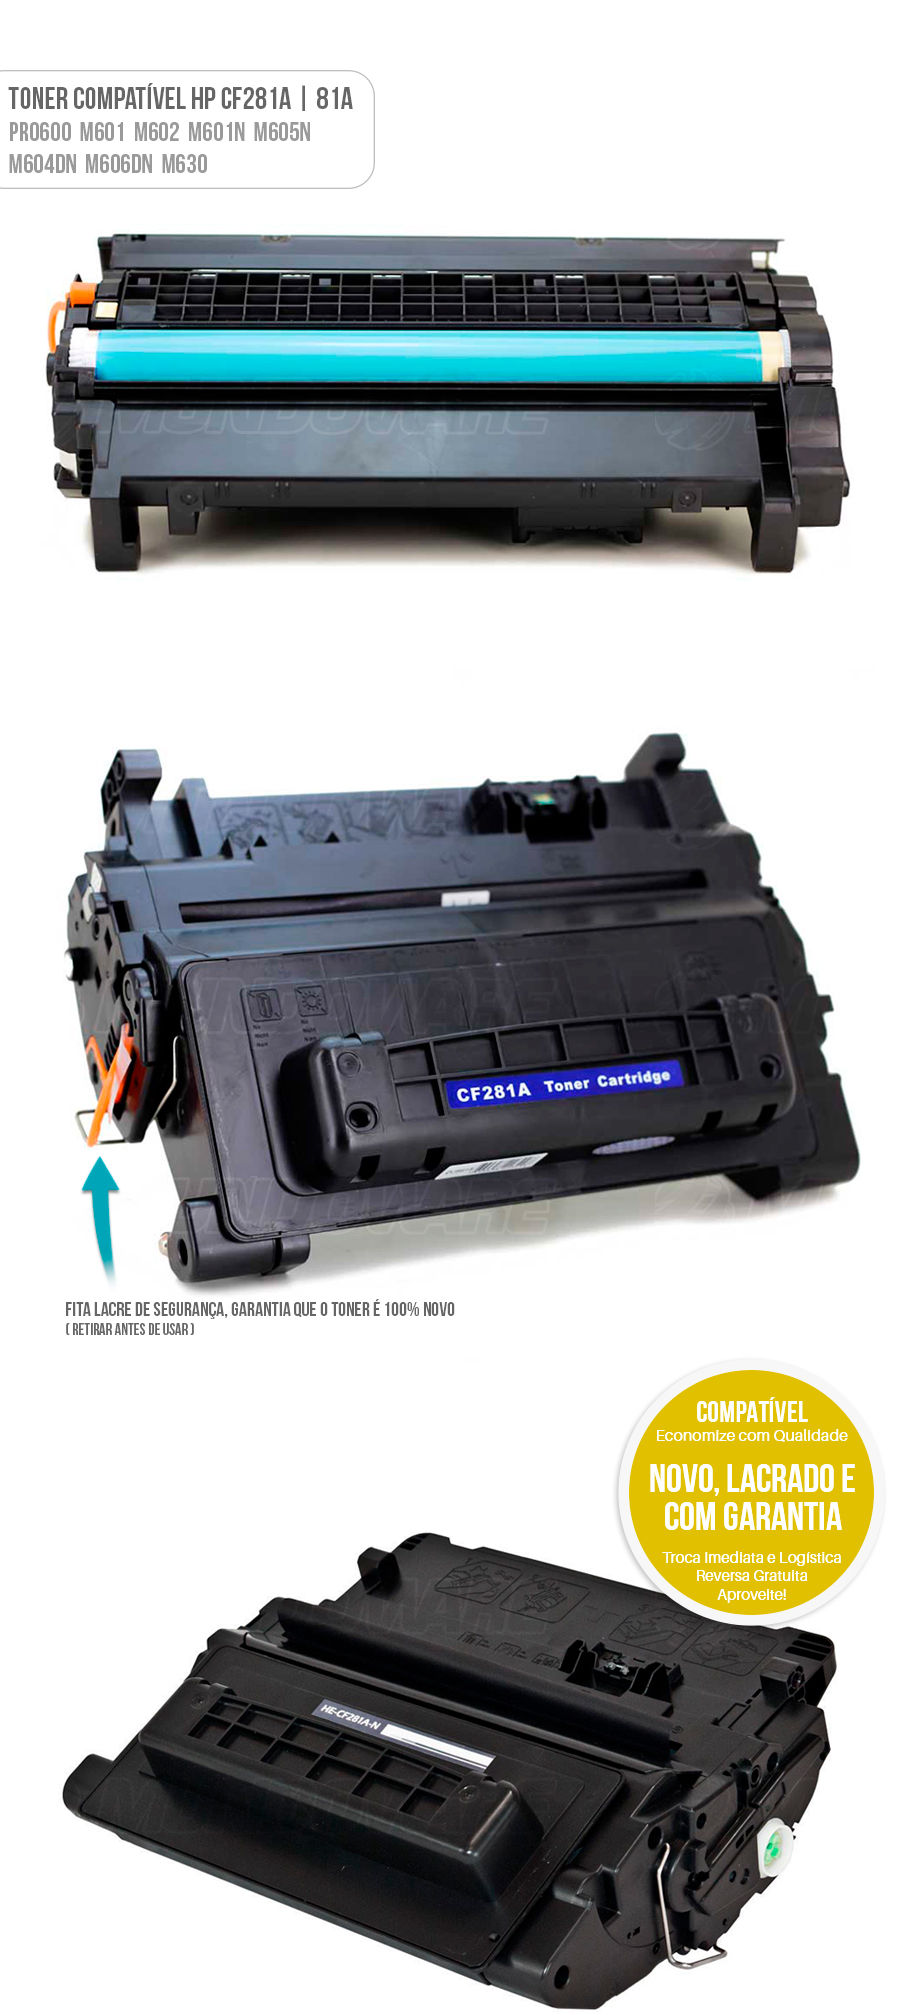 PRO600 M601 M602 M601N M605N M604DN M606DN M630 Tonner compativel para impressora laser